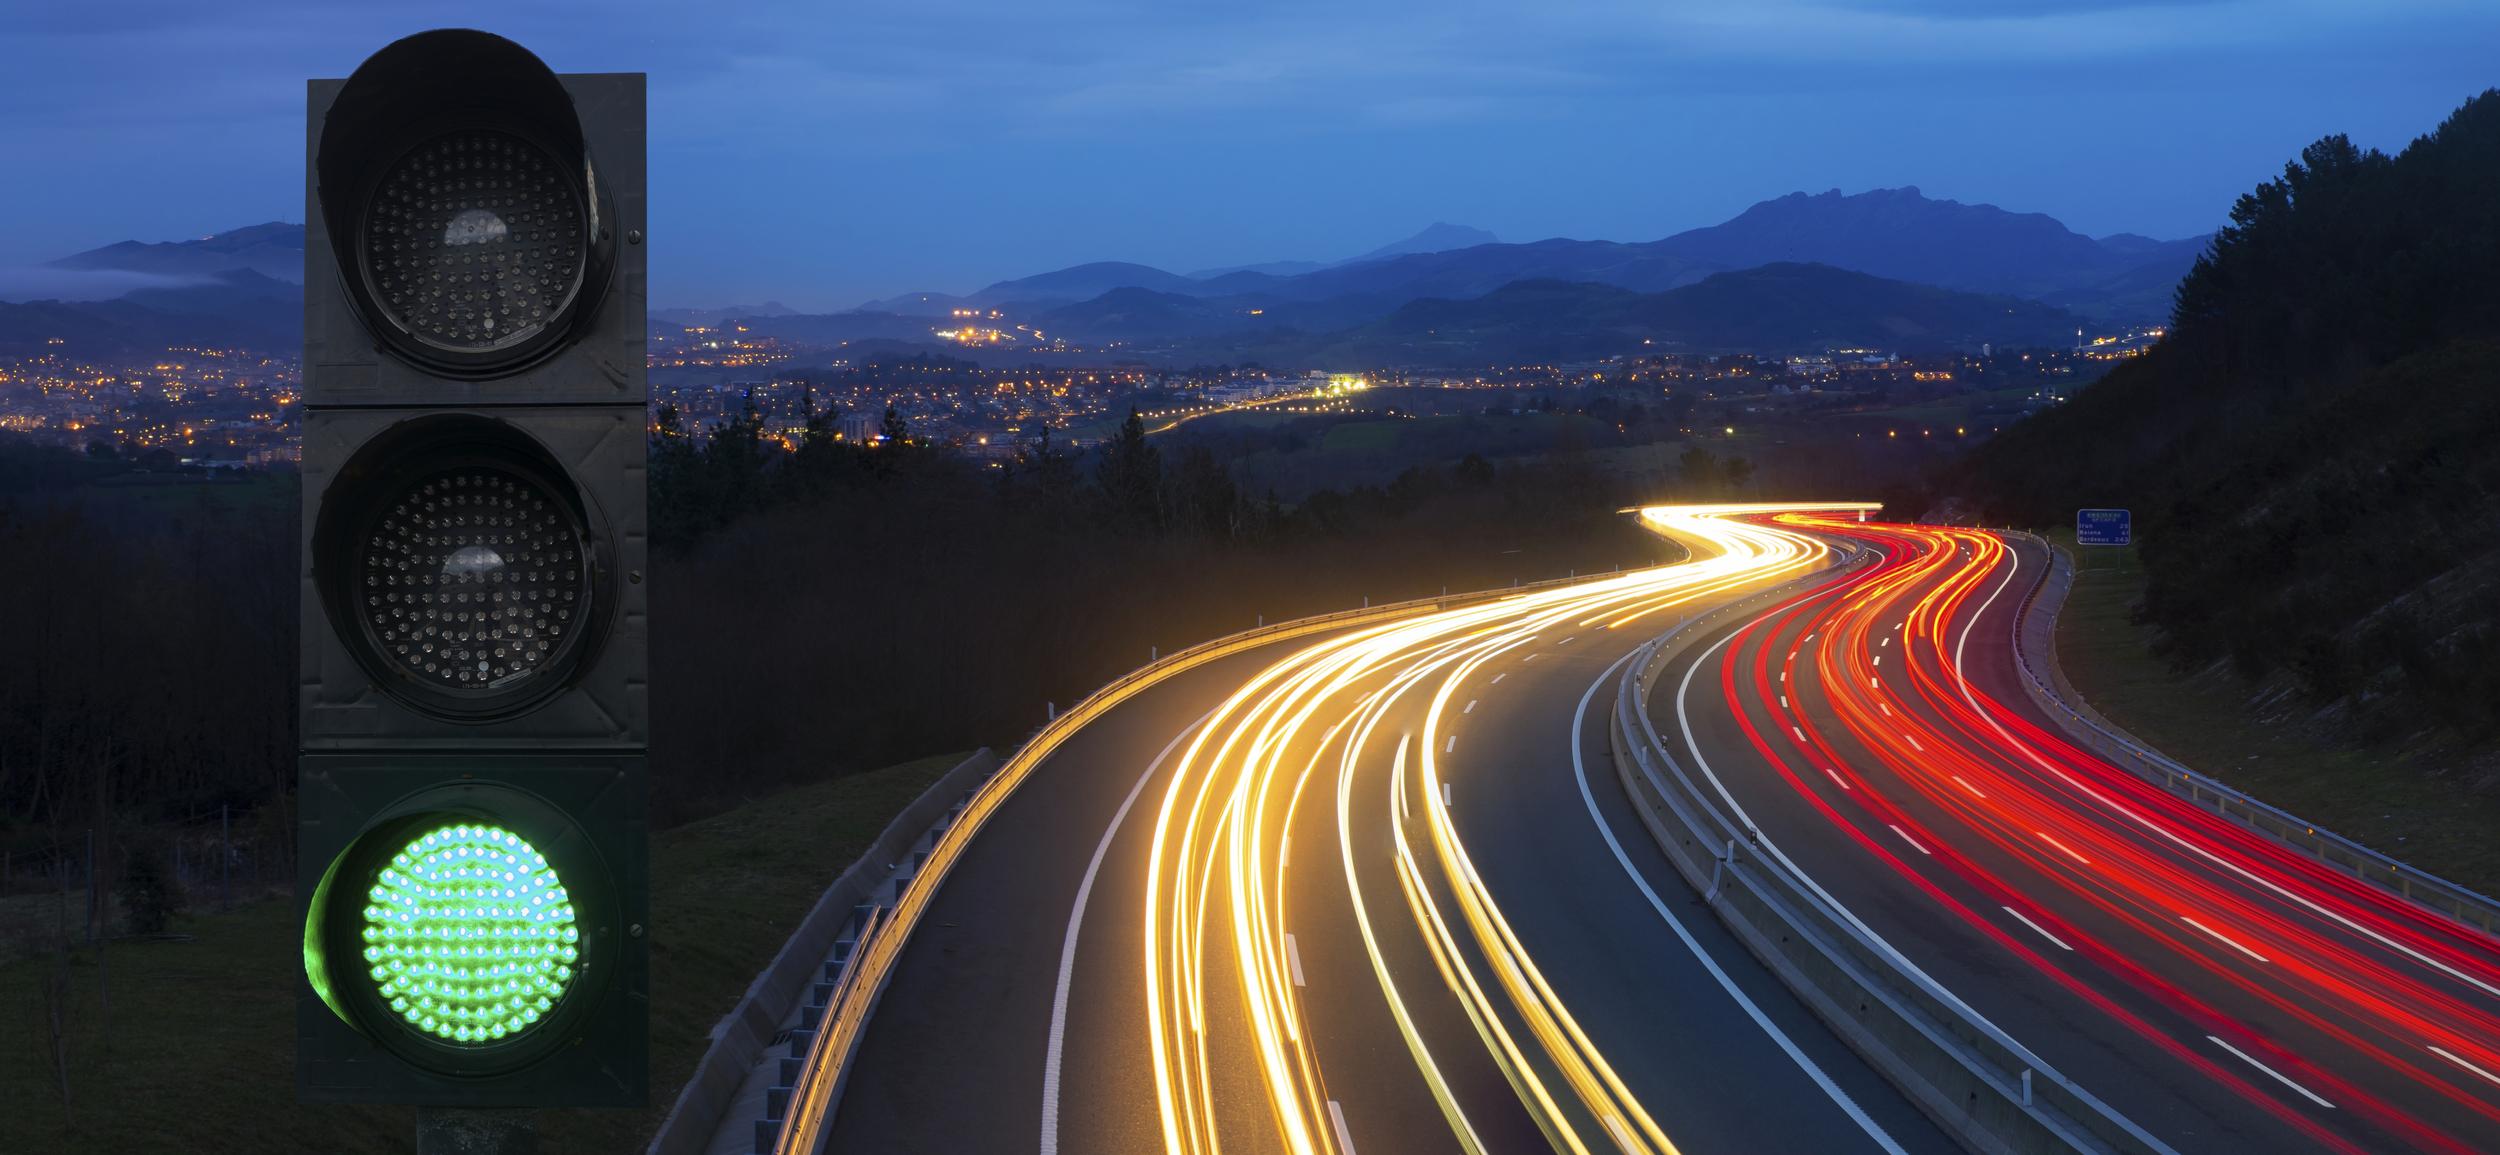 dive in. — NINA GRAE for Traffic Light On Road At Night  131fsj